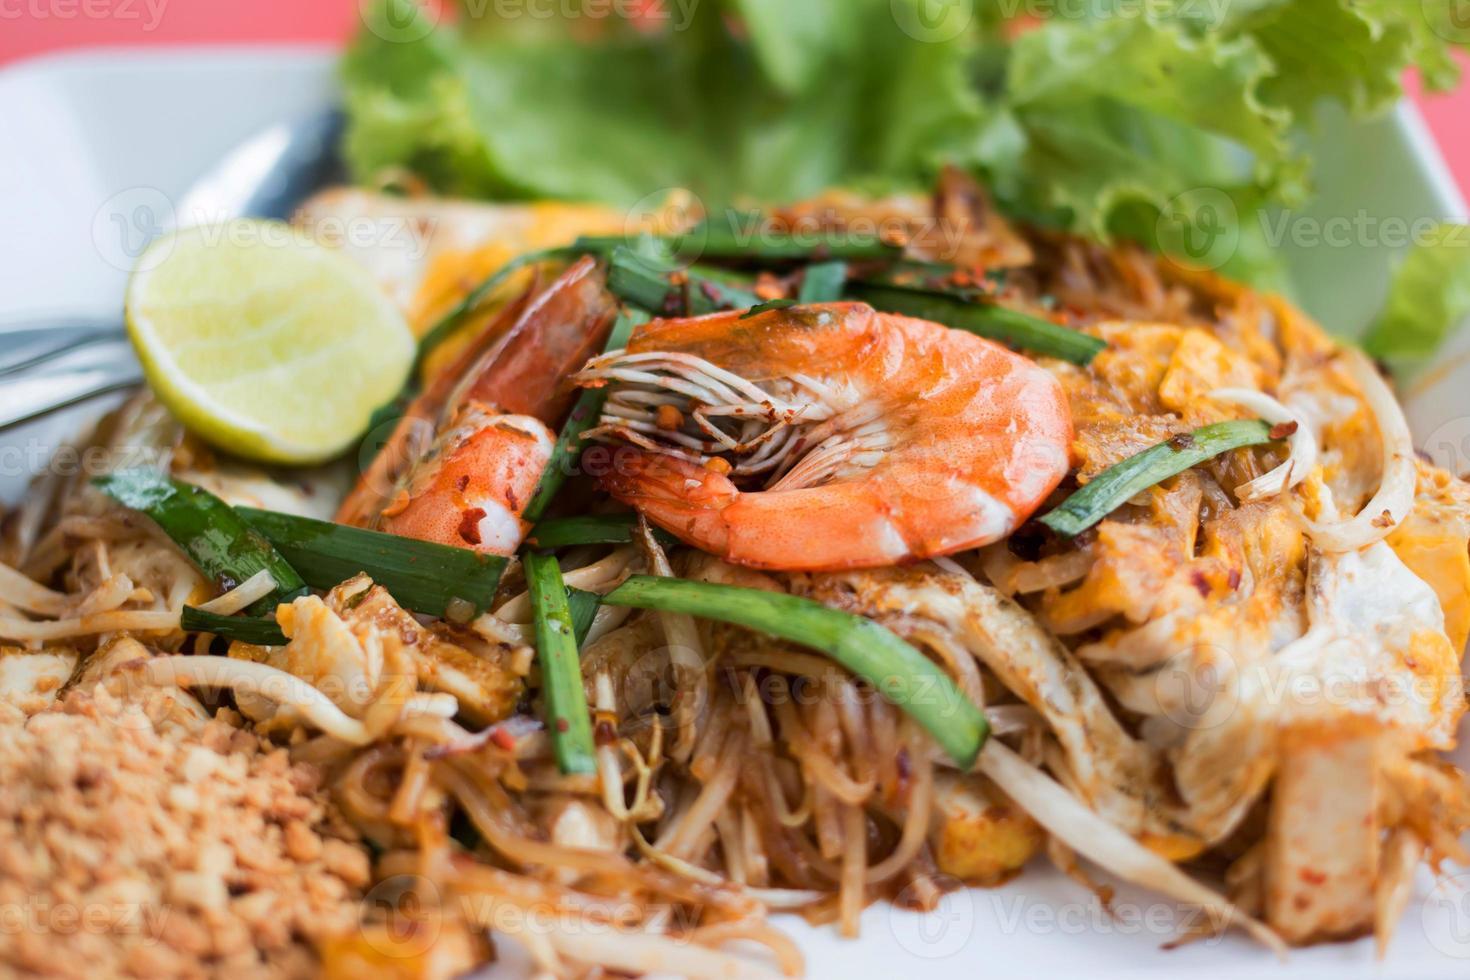 fideos de arroz salteados (pad thai) foto